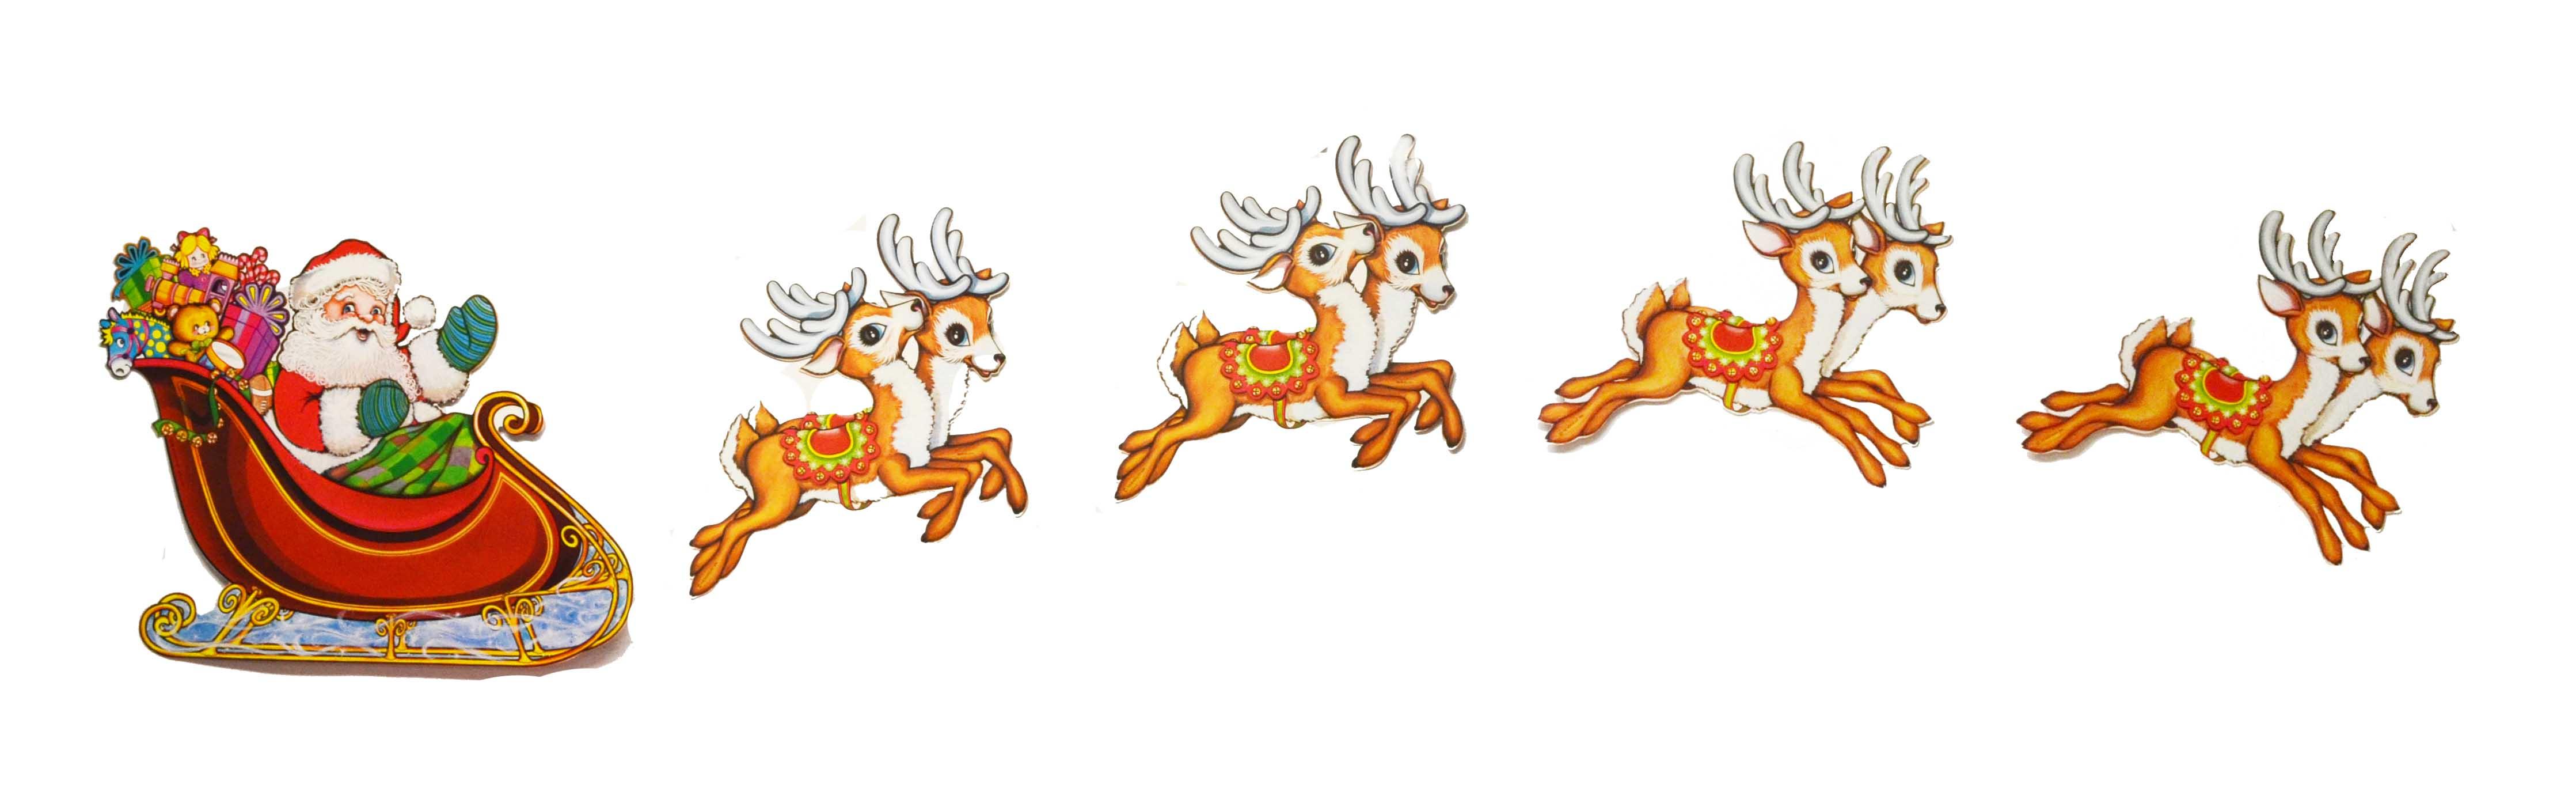 2m Santa Sleigh And Reindeer Christmas 5-2m Santa Sleigh And Reindeer Christmas 5pk Cutout Decoration Ebay-2